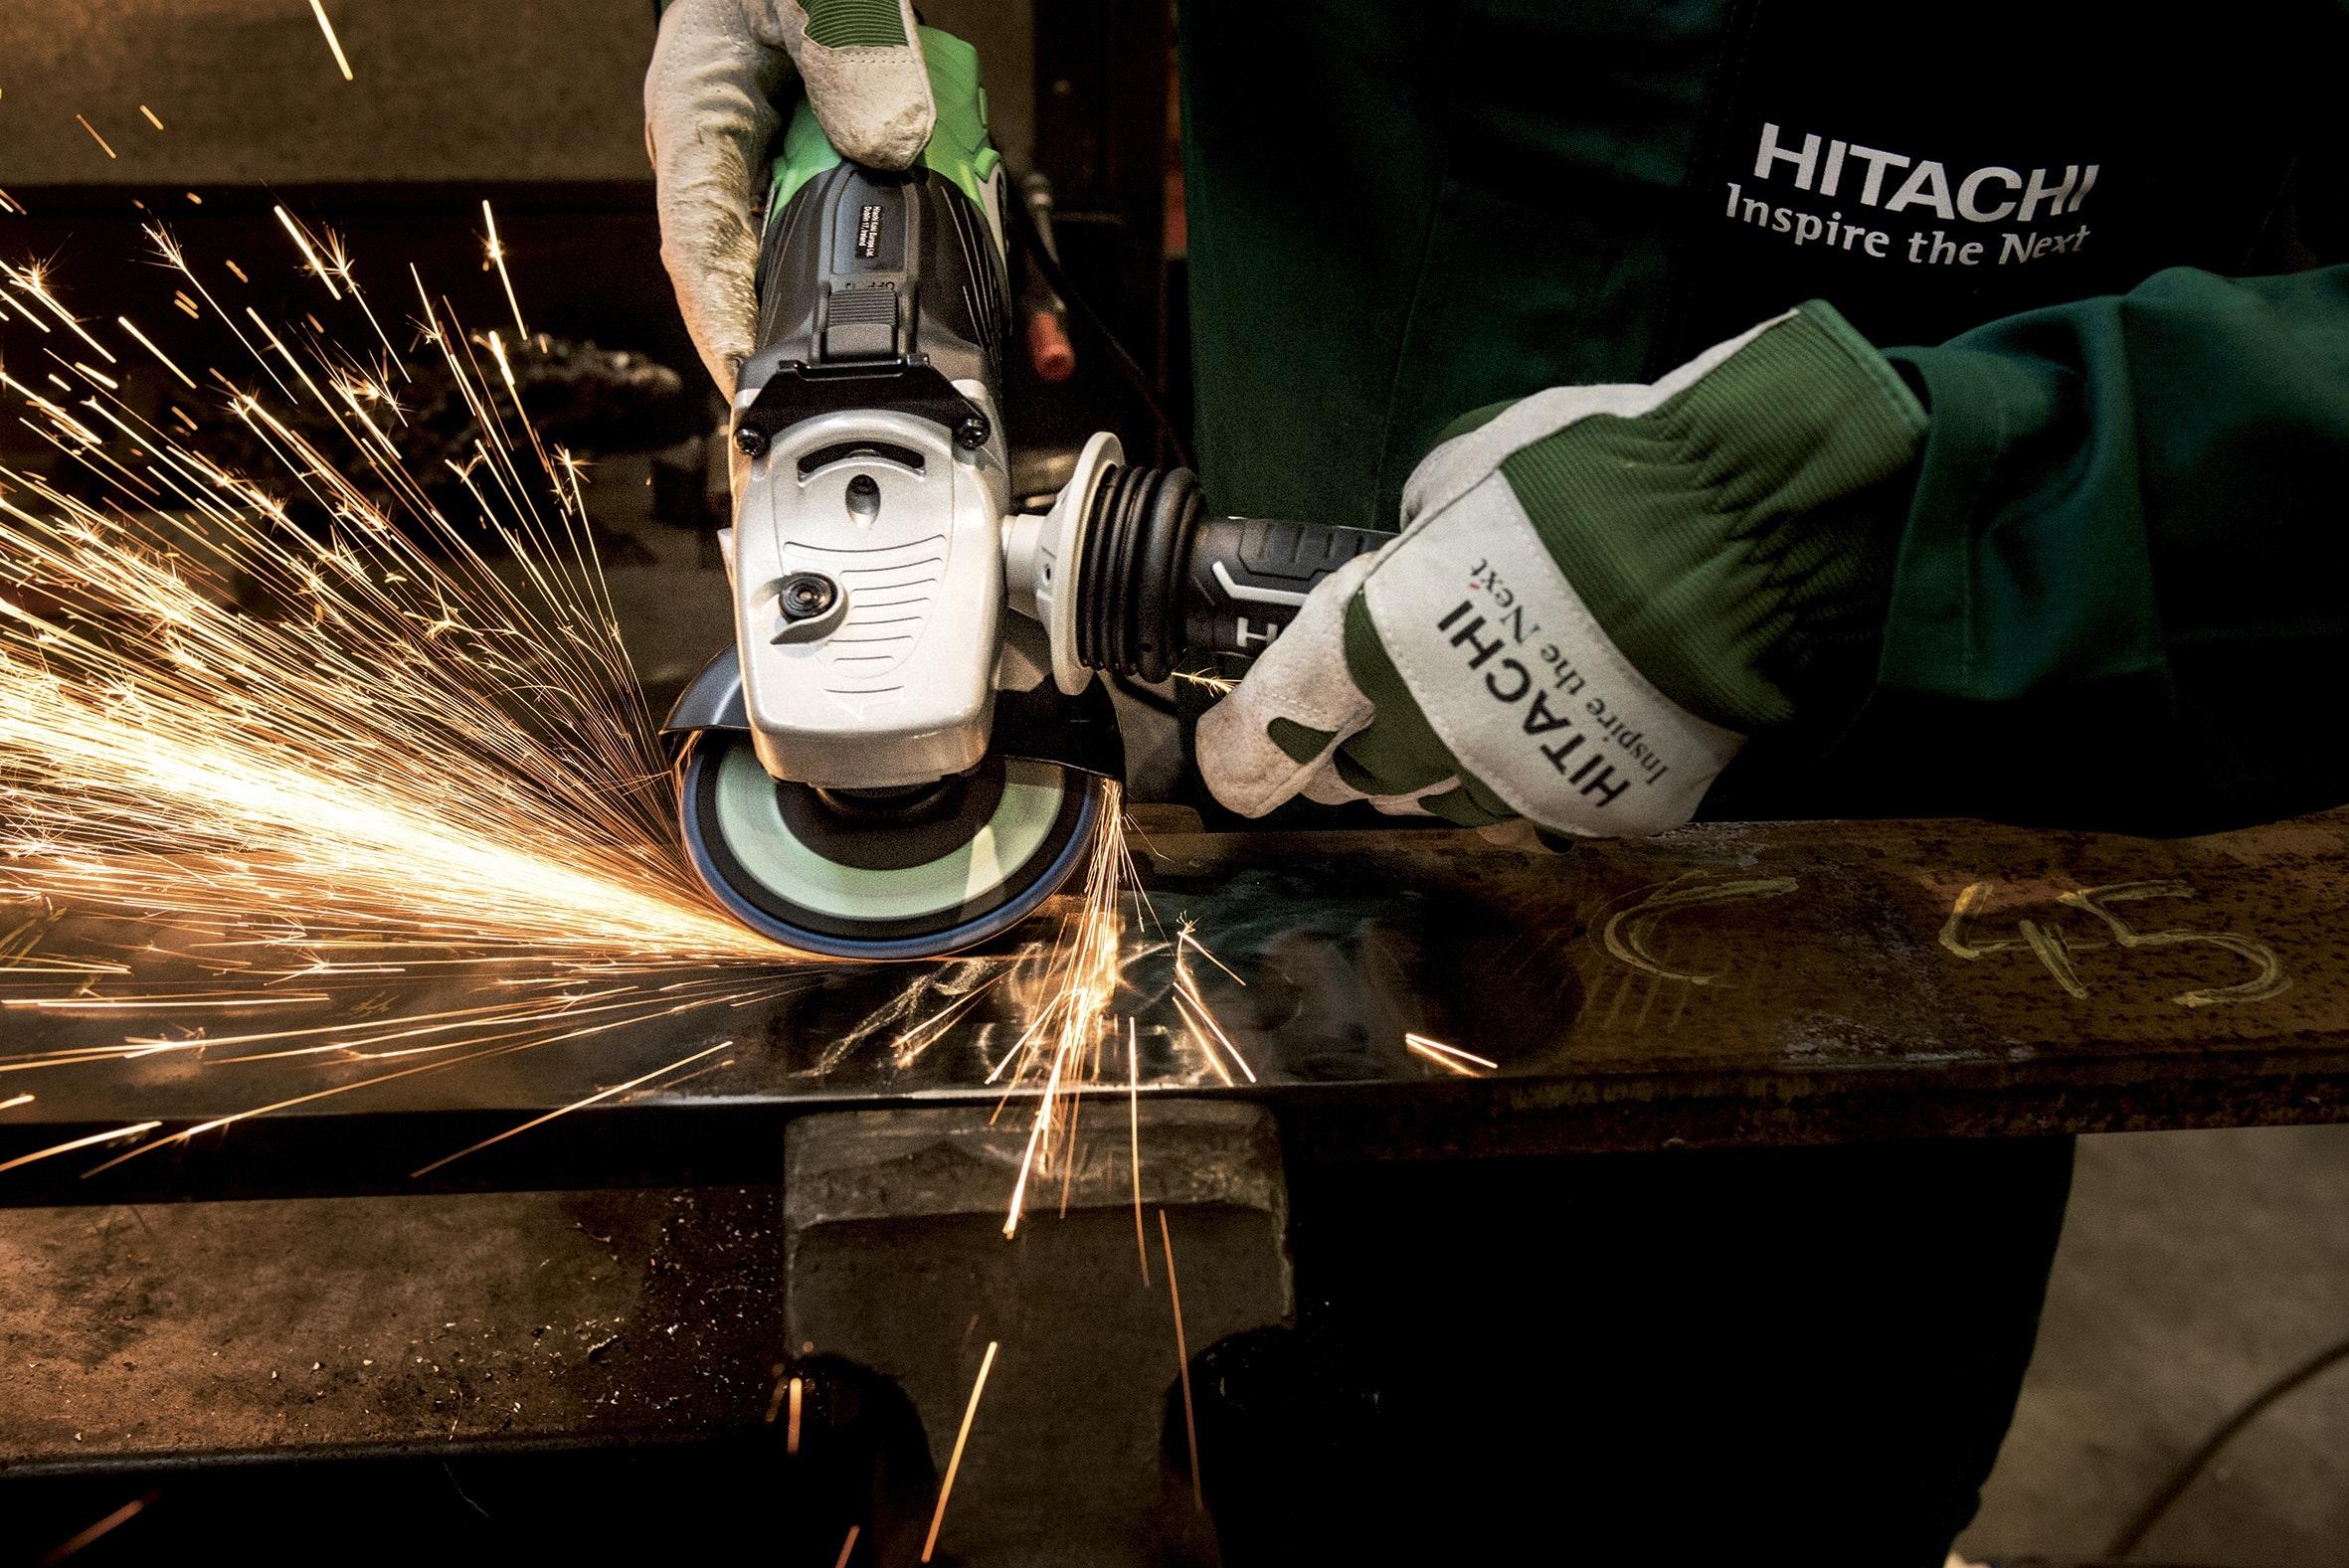 Hitachi white black angle grinder photo